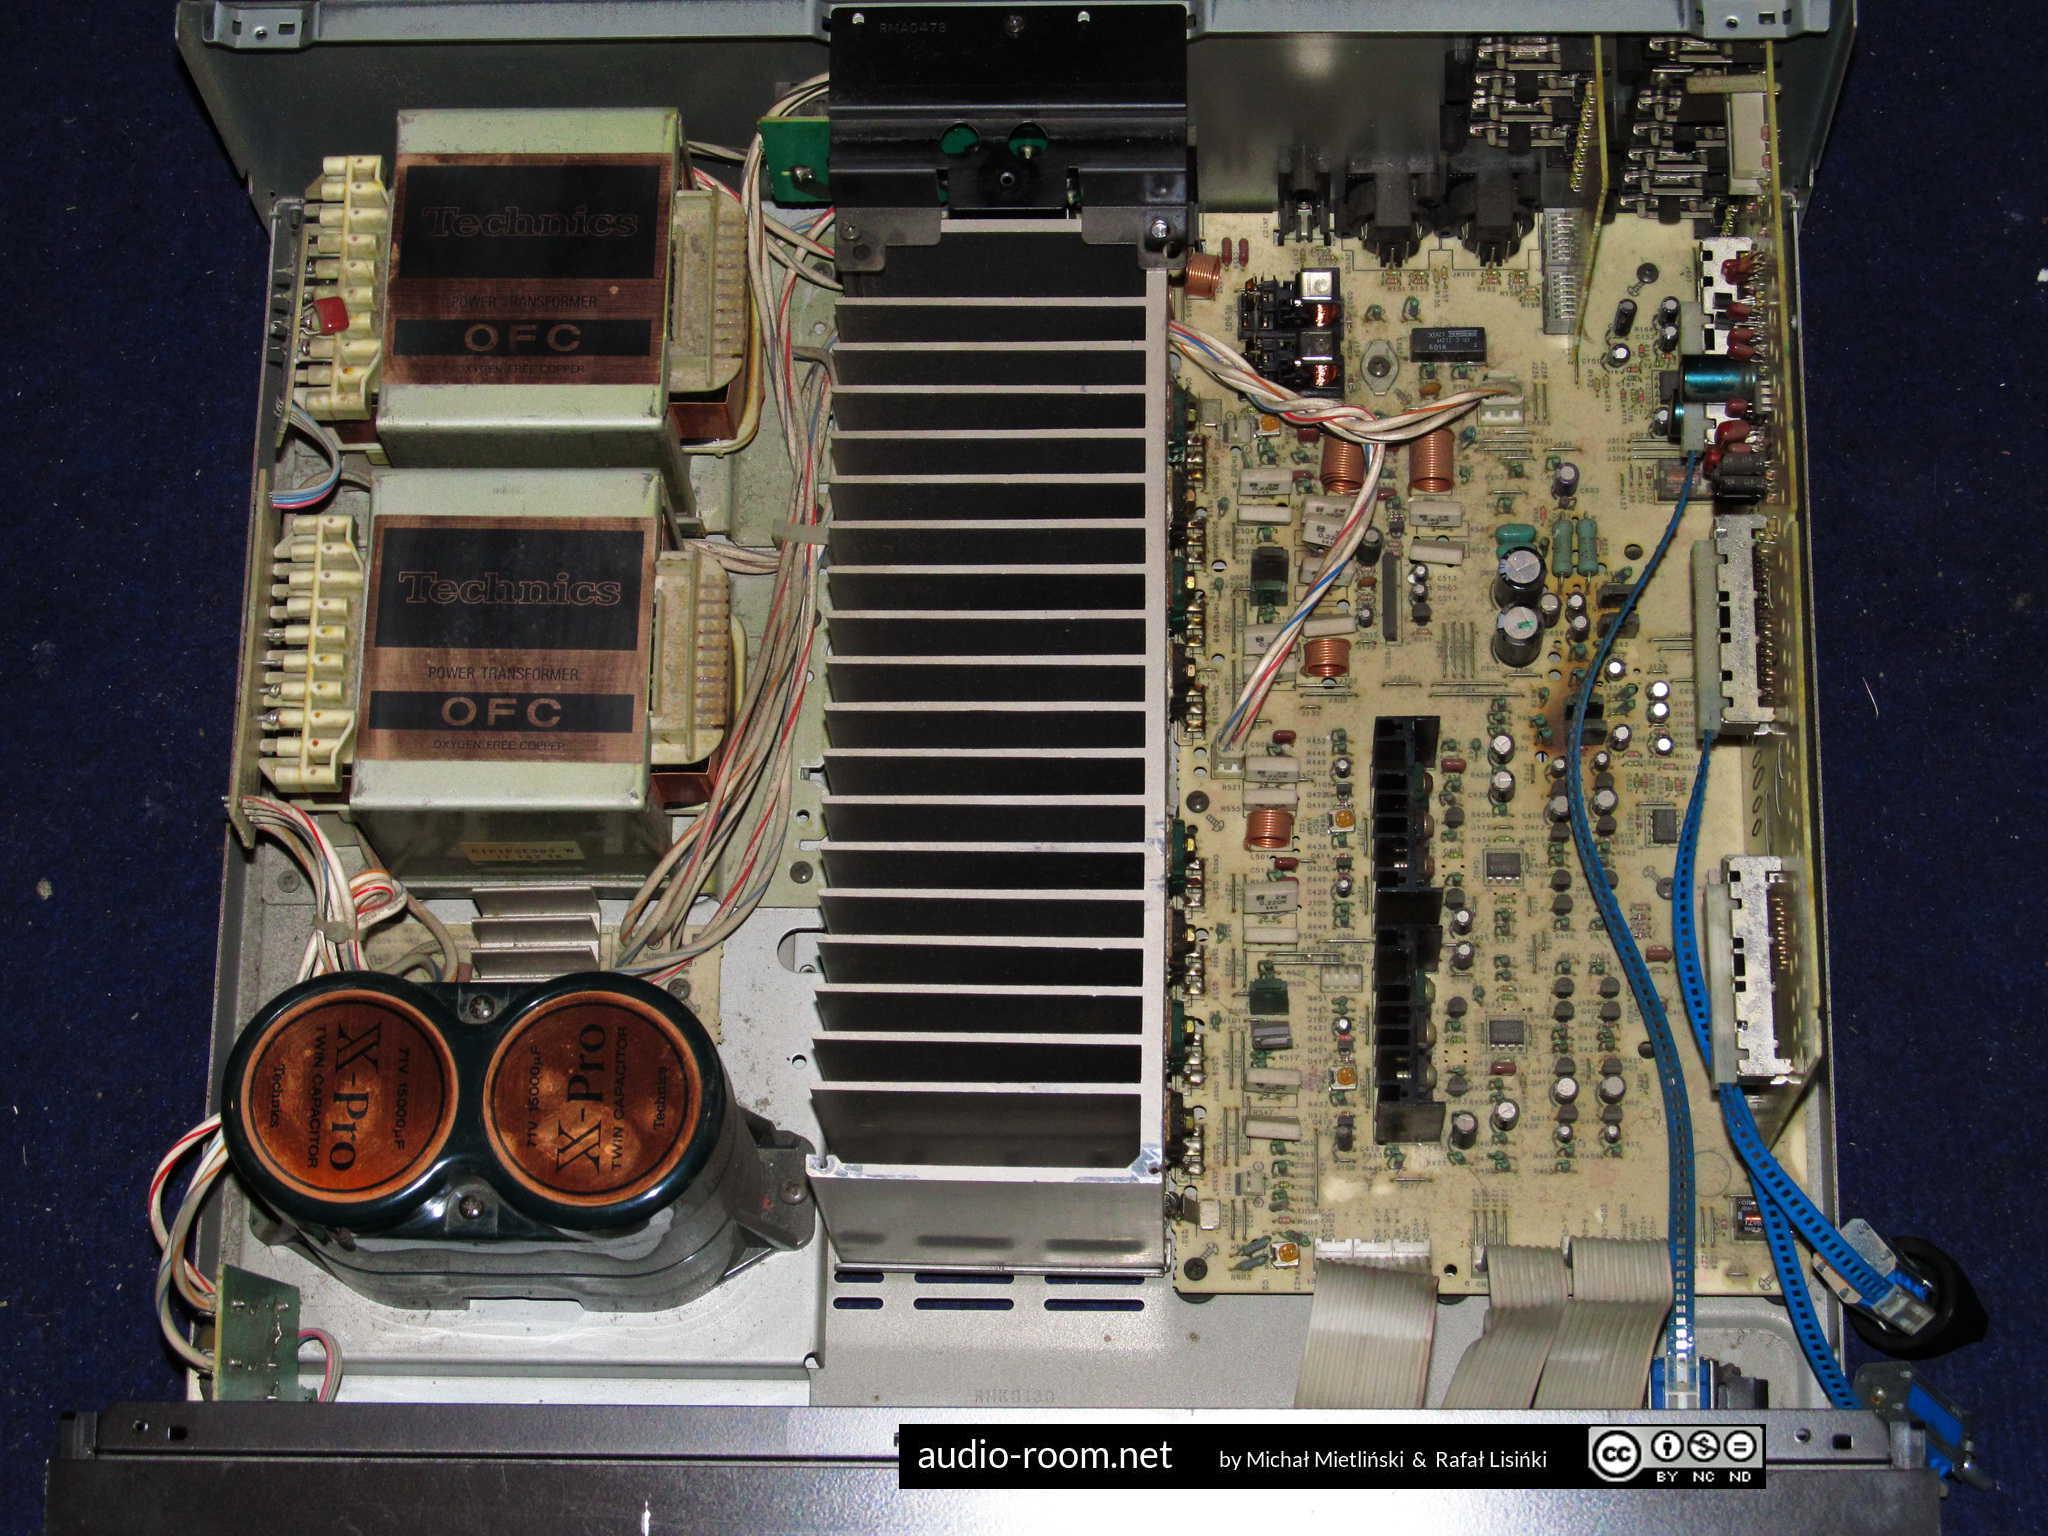 technics_su-vx800_cimg_0011a